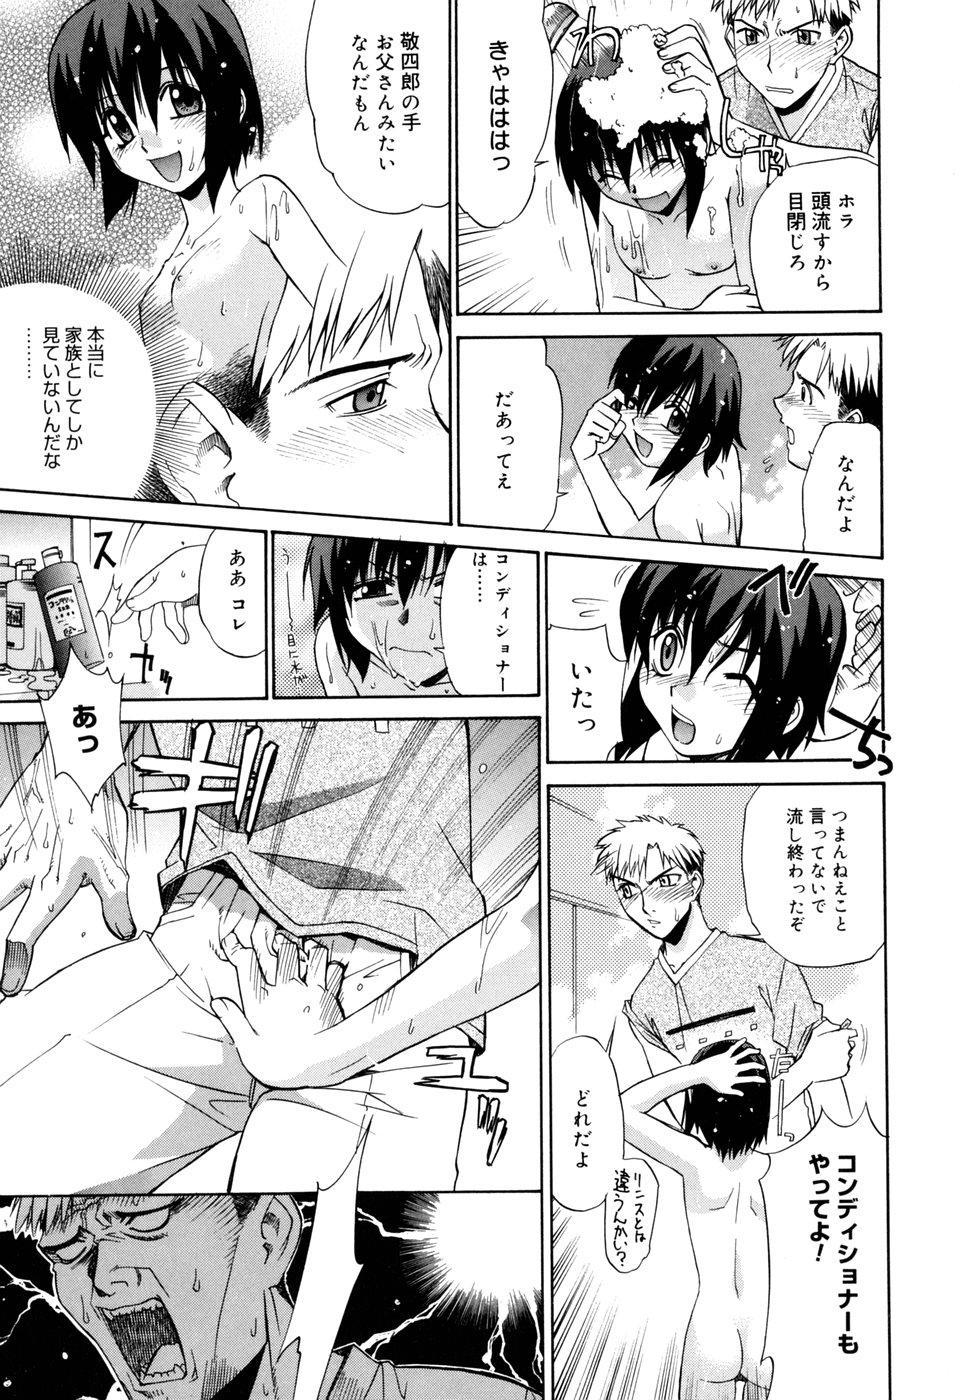 [Yaya Hinata] Tonari no Miko-san wa Minna Warau - The next shrine maidens smile in everyone. 206